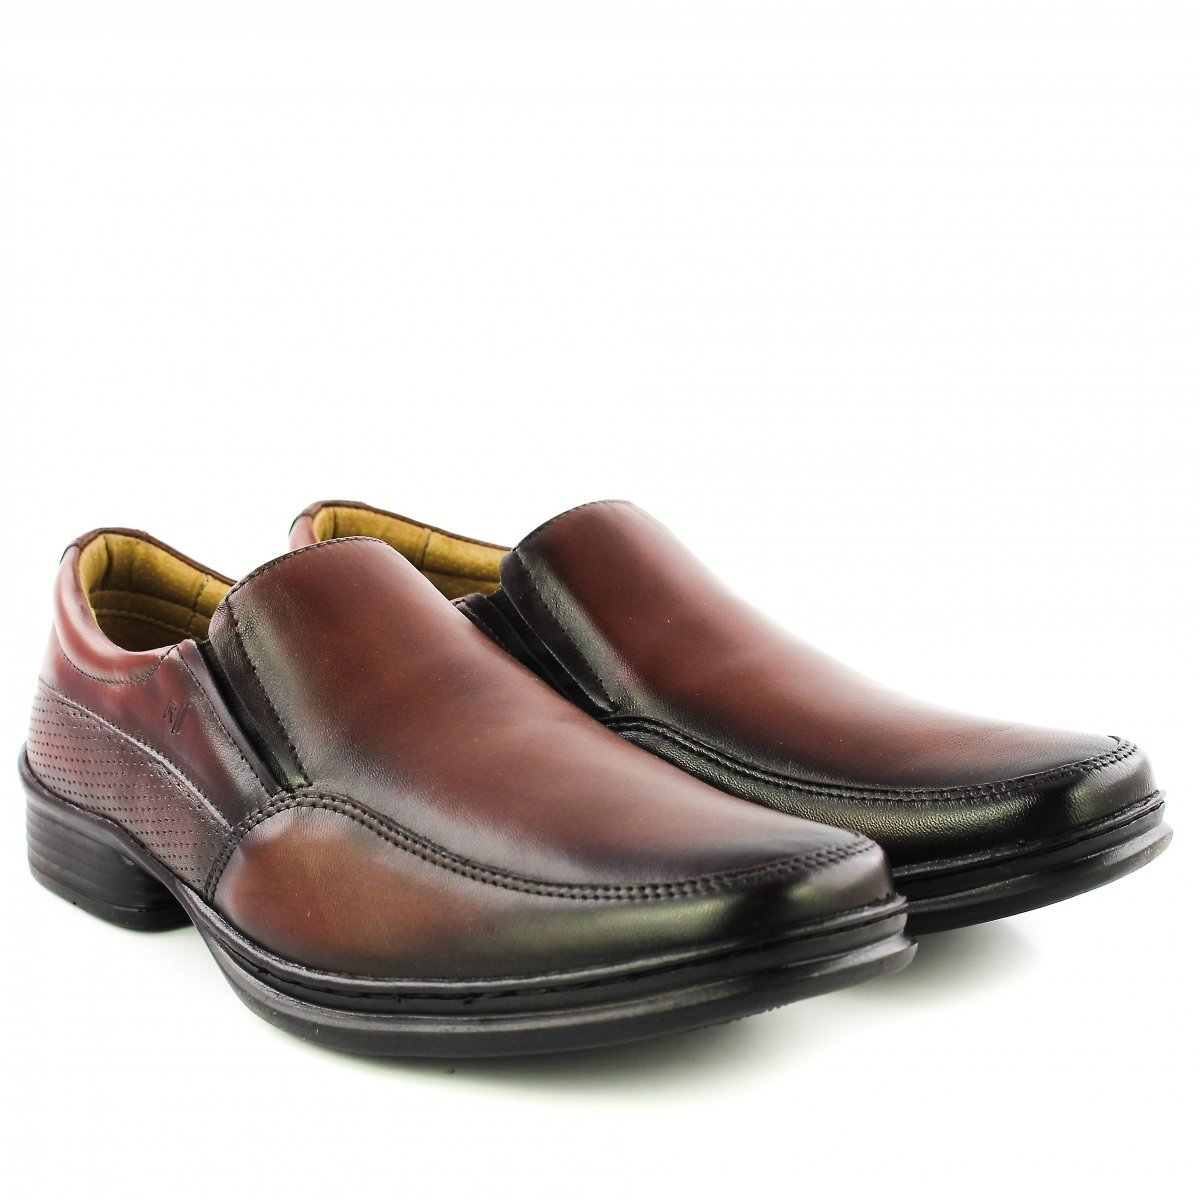 ef596a3a02 Sapato Rafarillo - Compre Agora